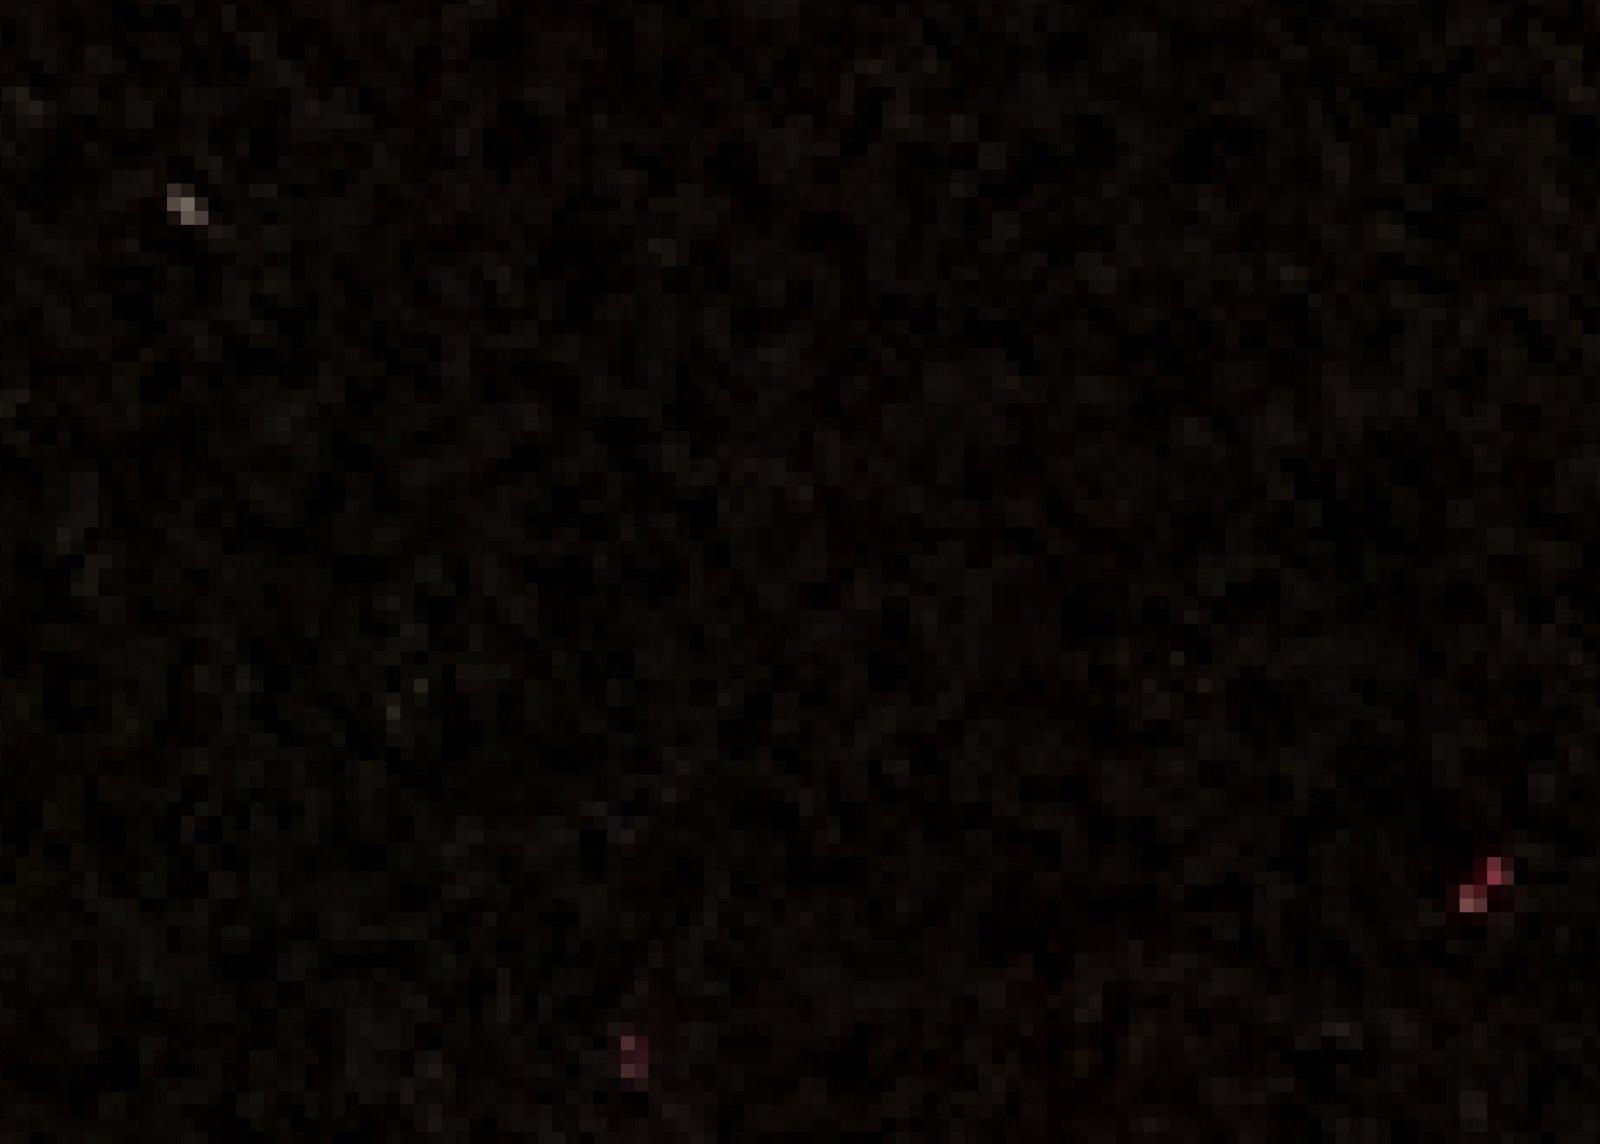 Metabunk 2020-04-29 08-14-50.jpg